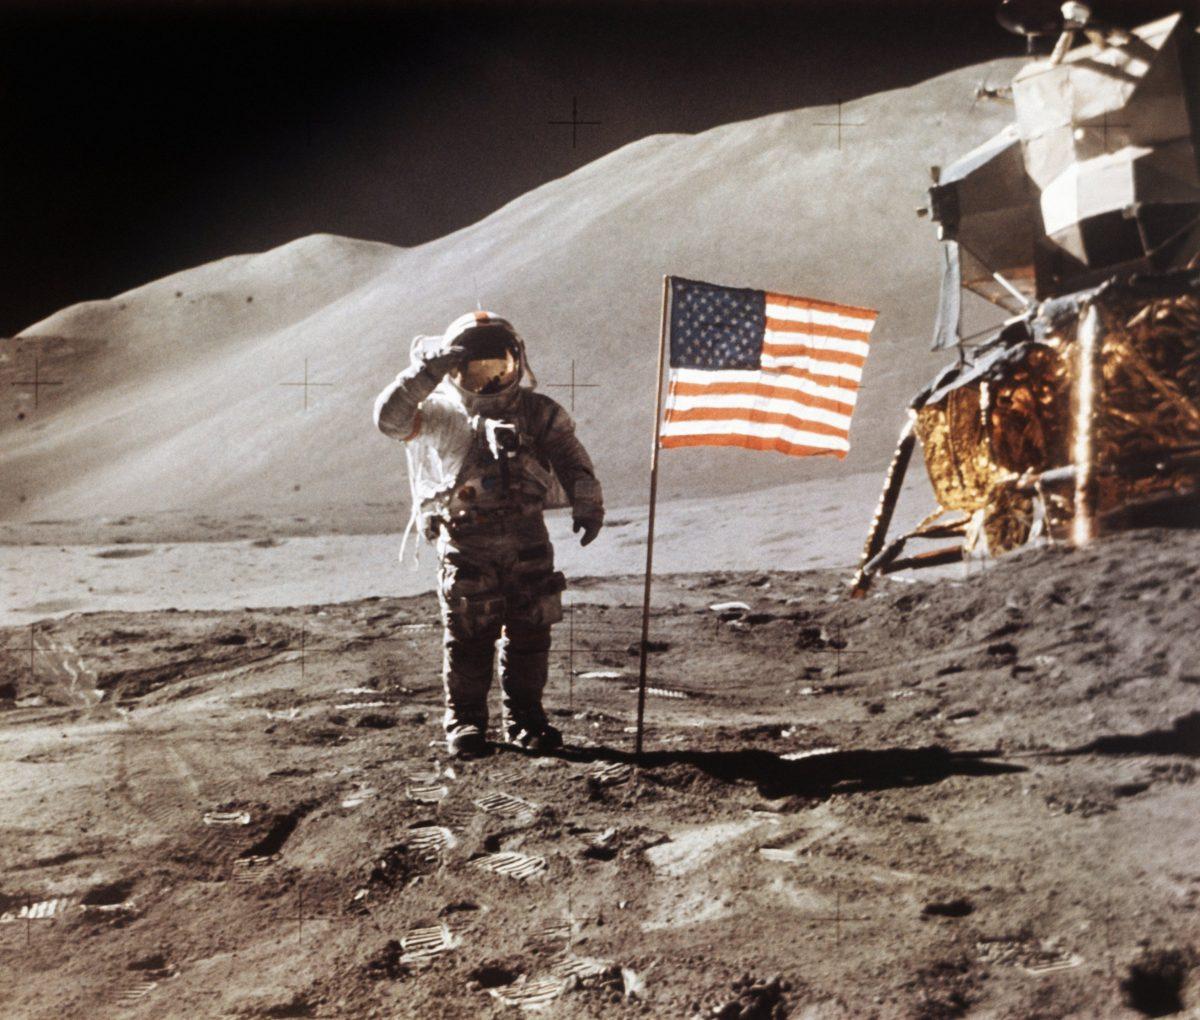 Apollo 15 Lunar Module Pilot James B. Irwin